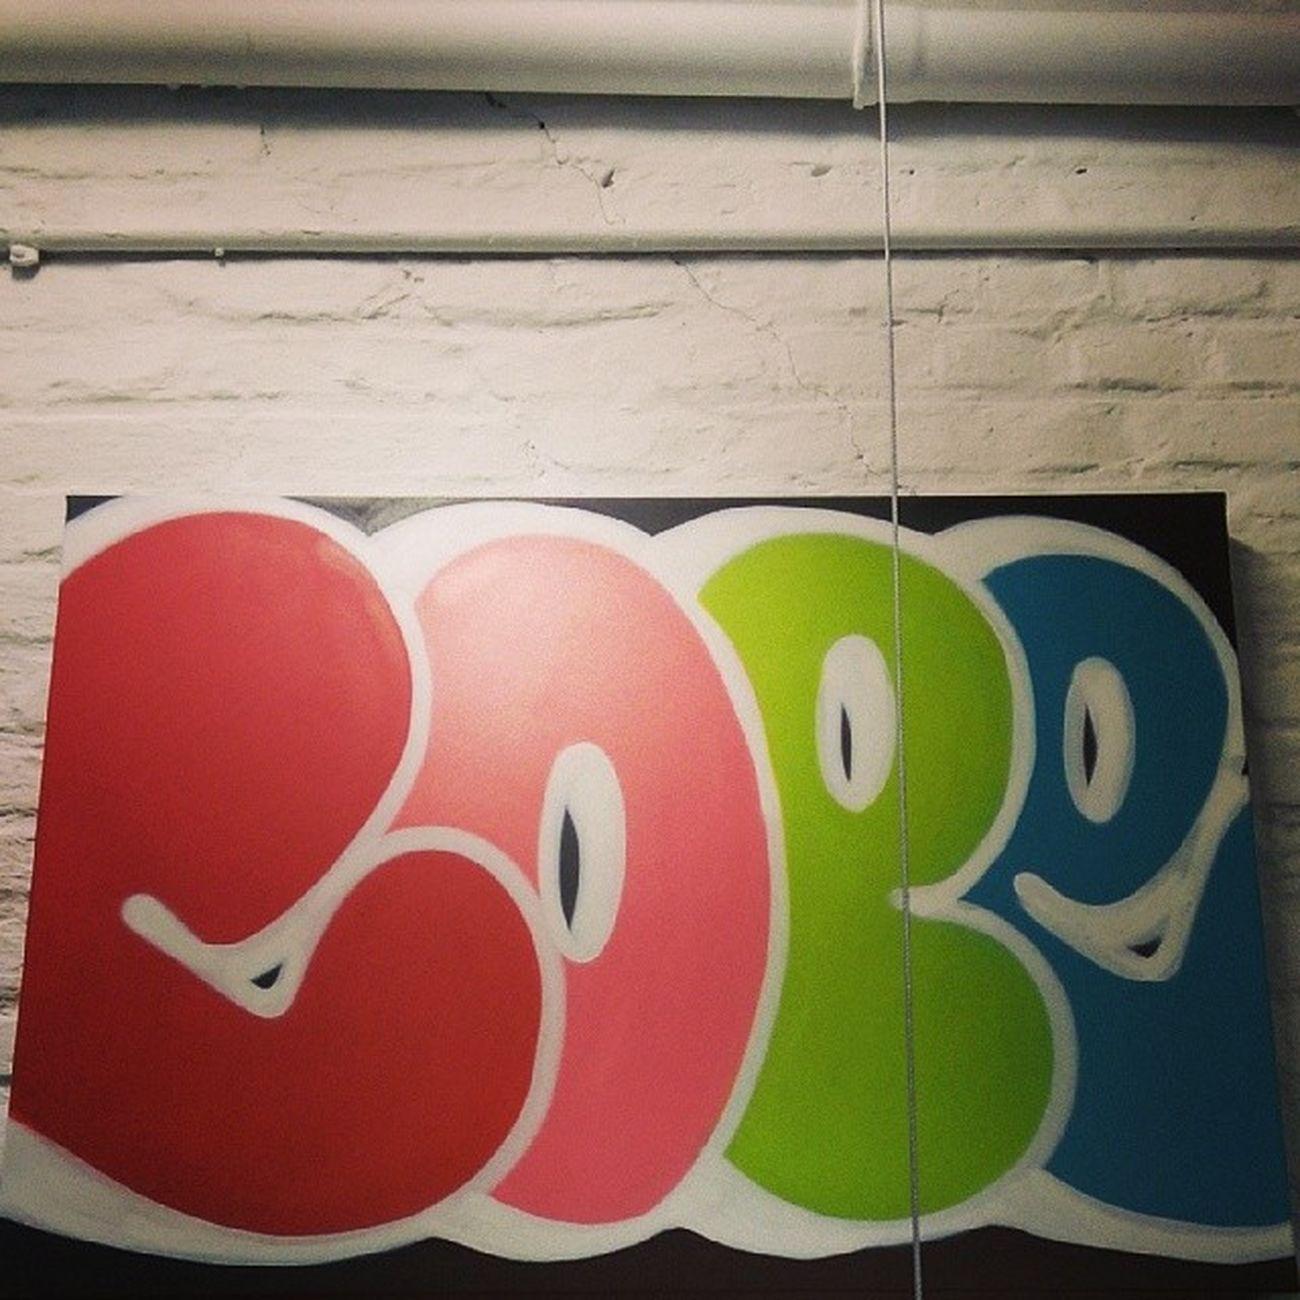 Cope2 Cope Cologne Showroom of love wemoto graffiti oldschool hero